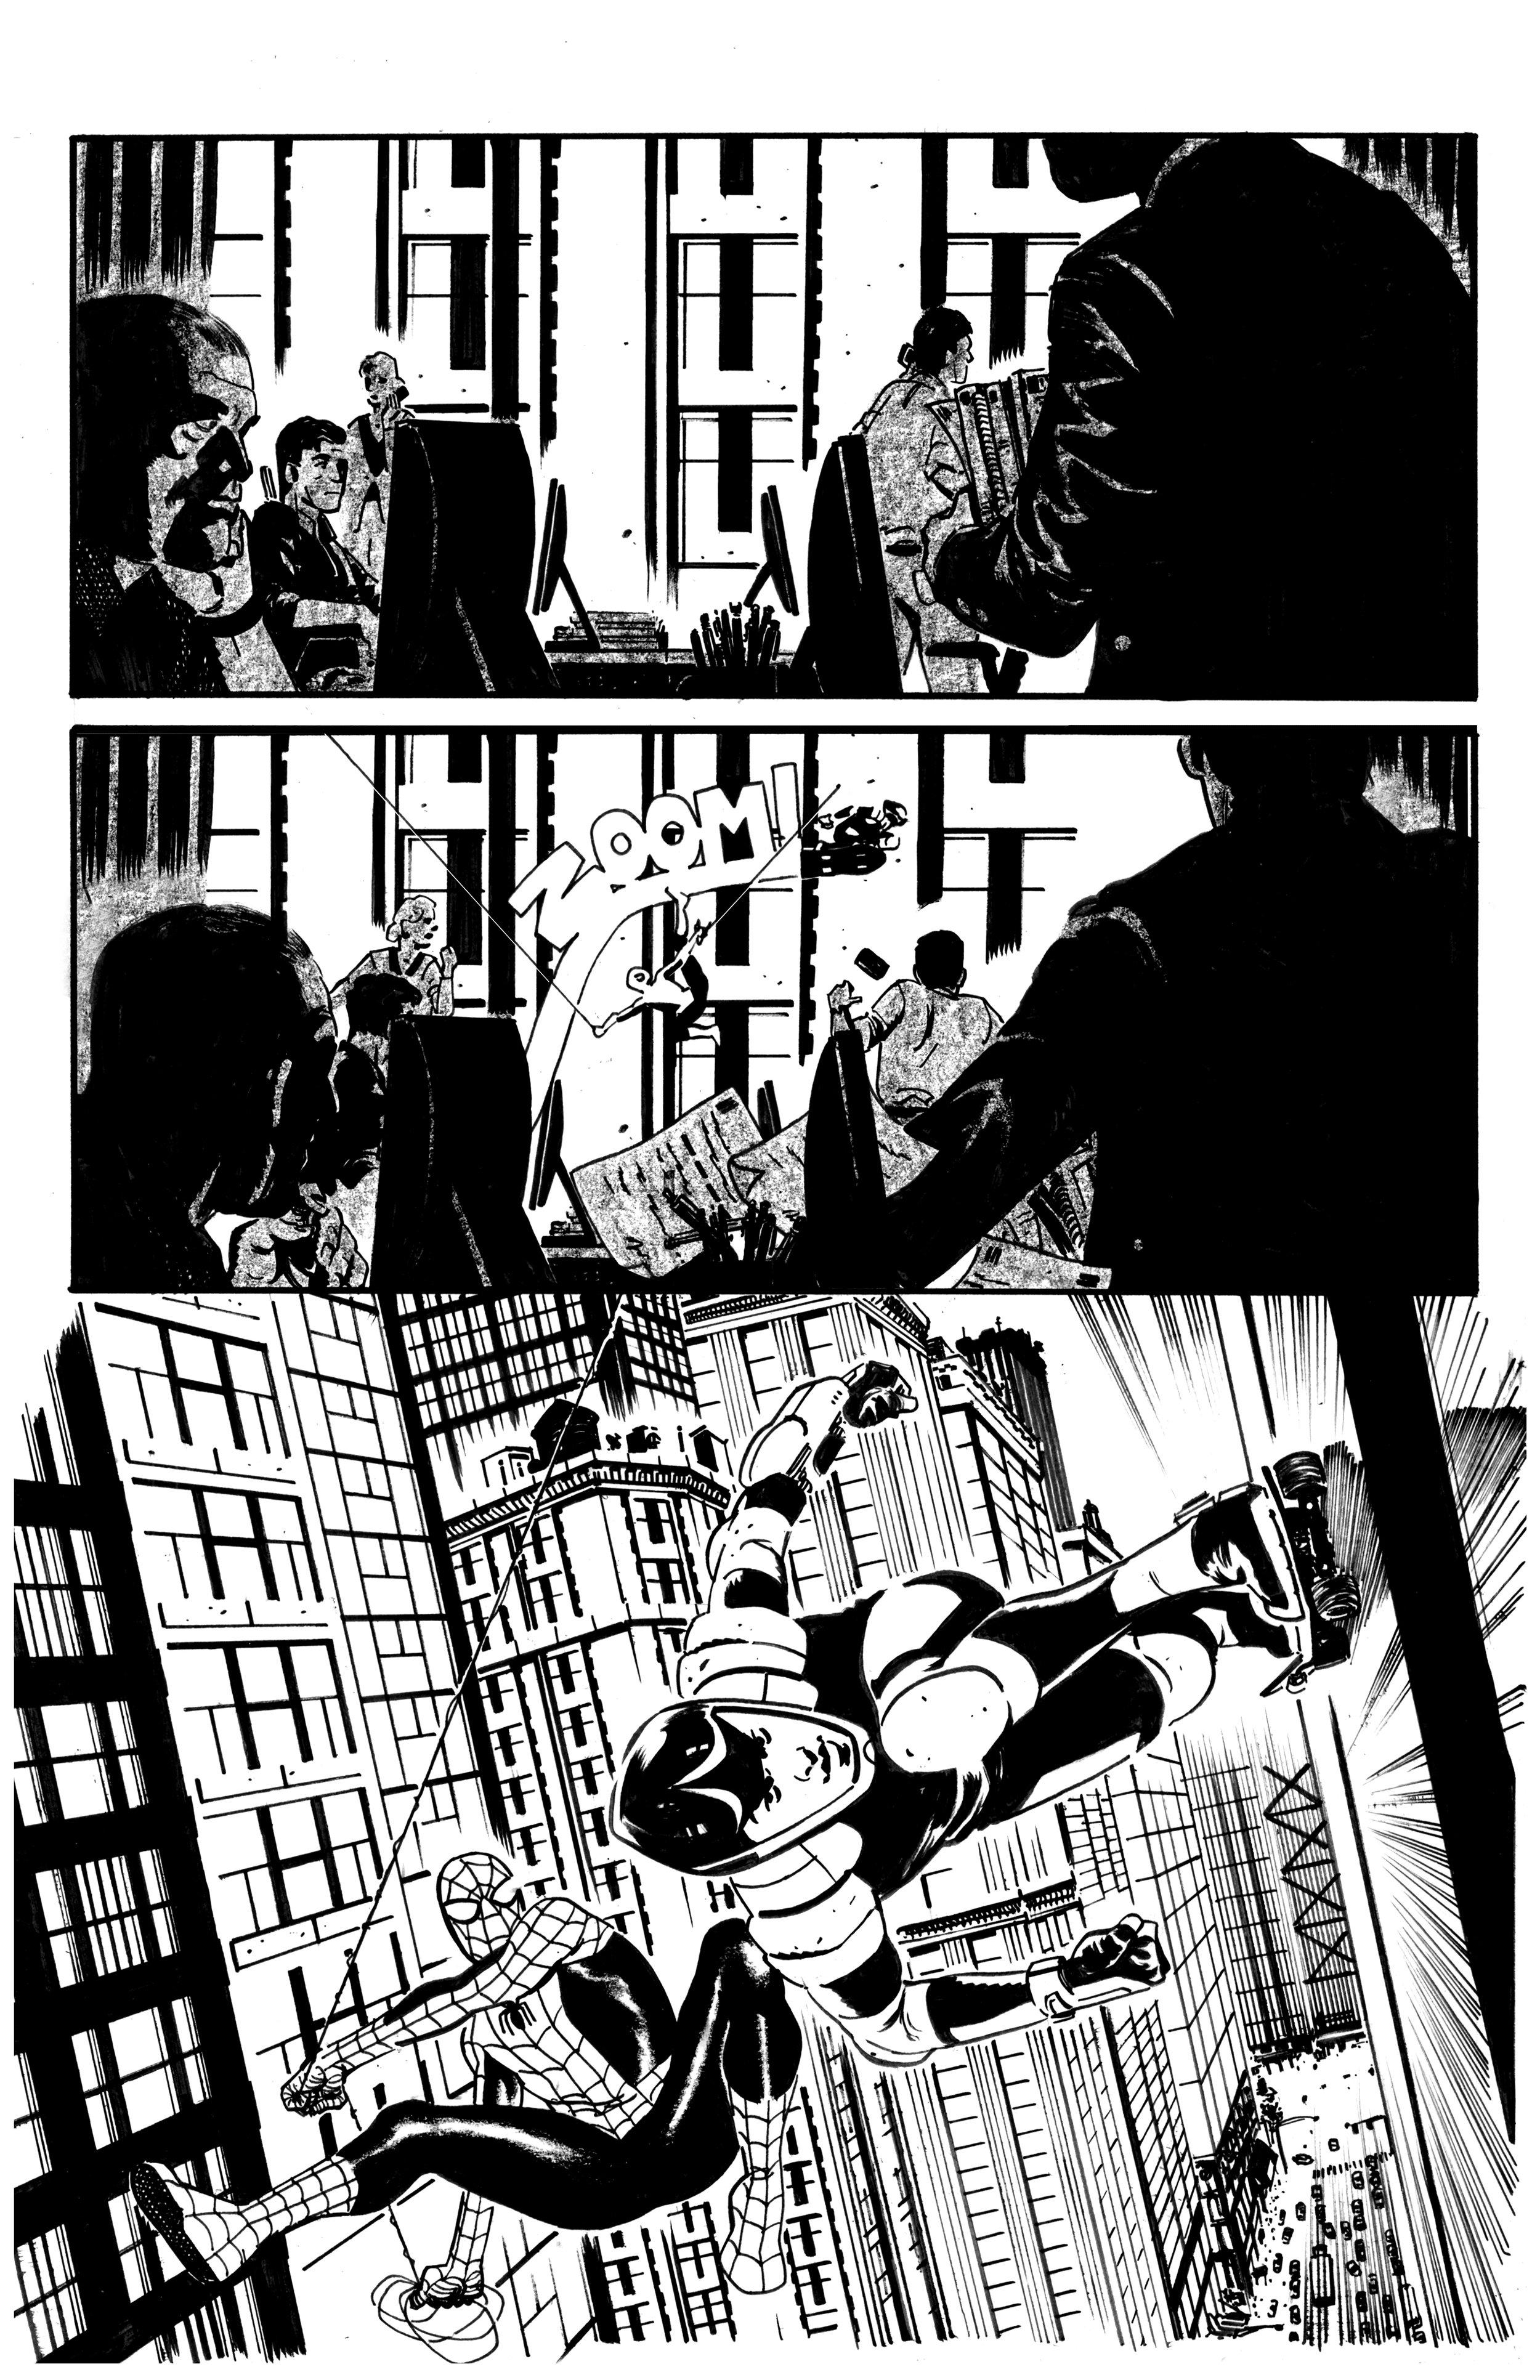 Spiderman-1-Web.jpg